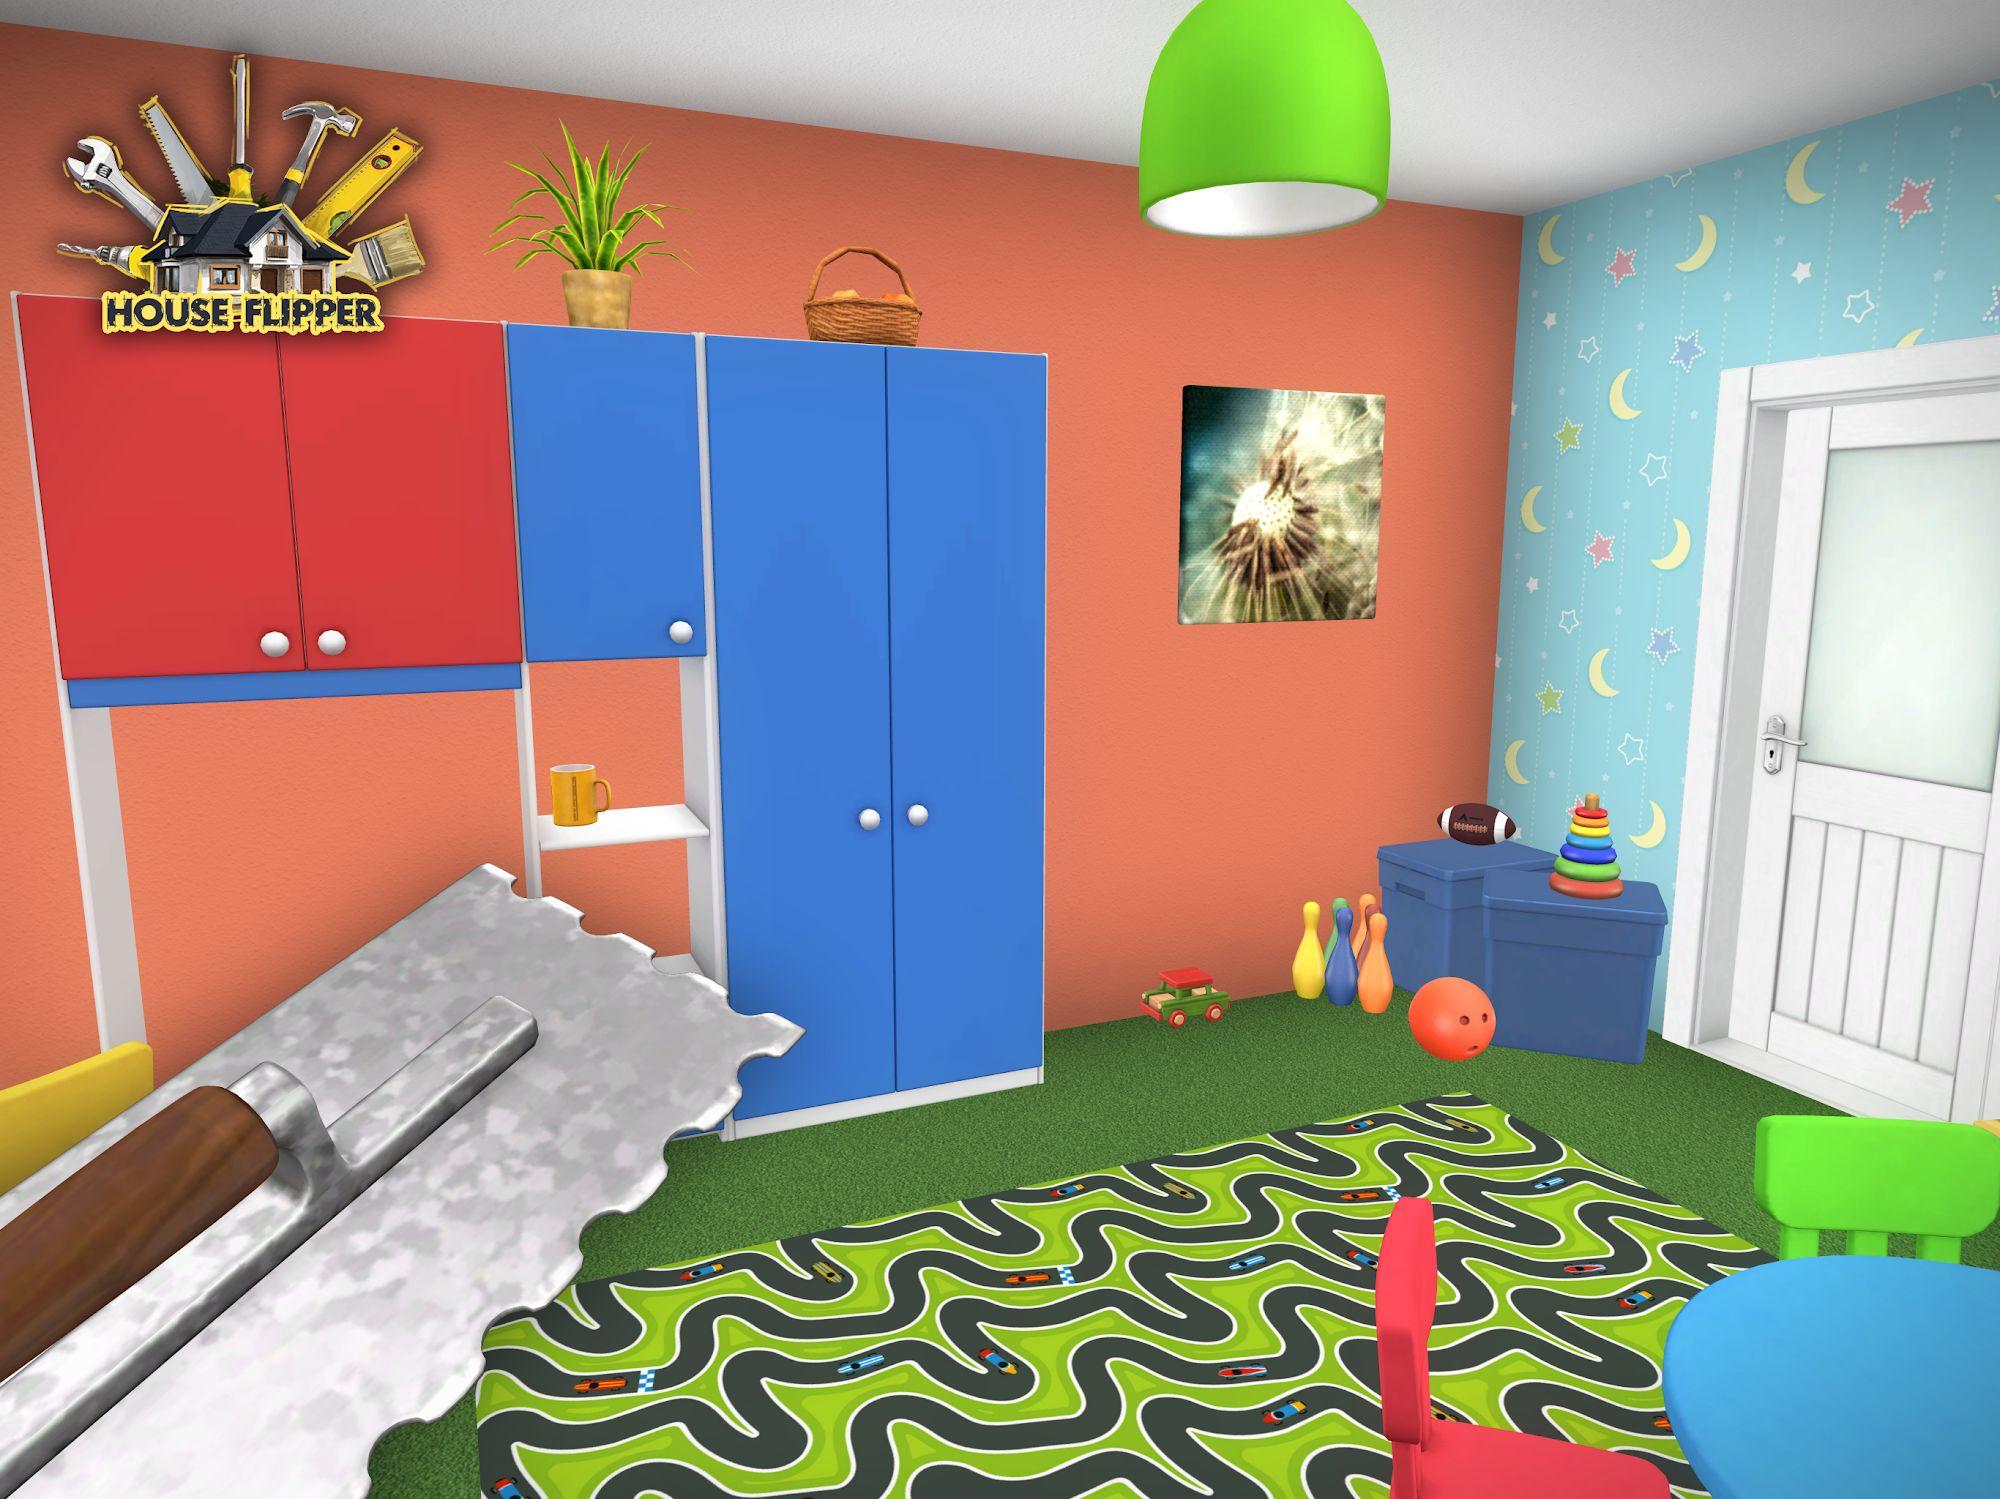 House Flipper: Home Design, Renovation Games скріншот 1